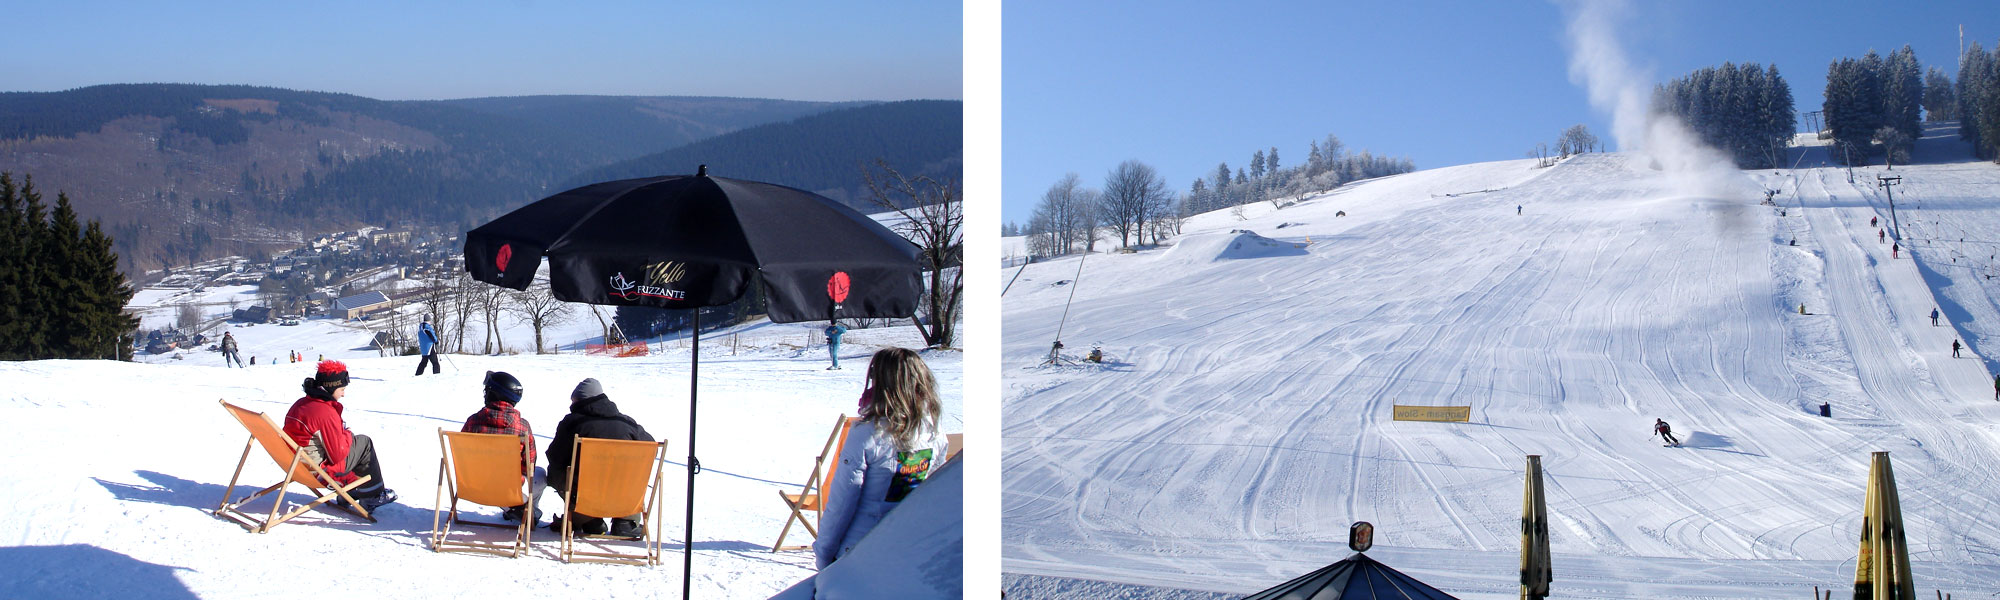 skihang2